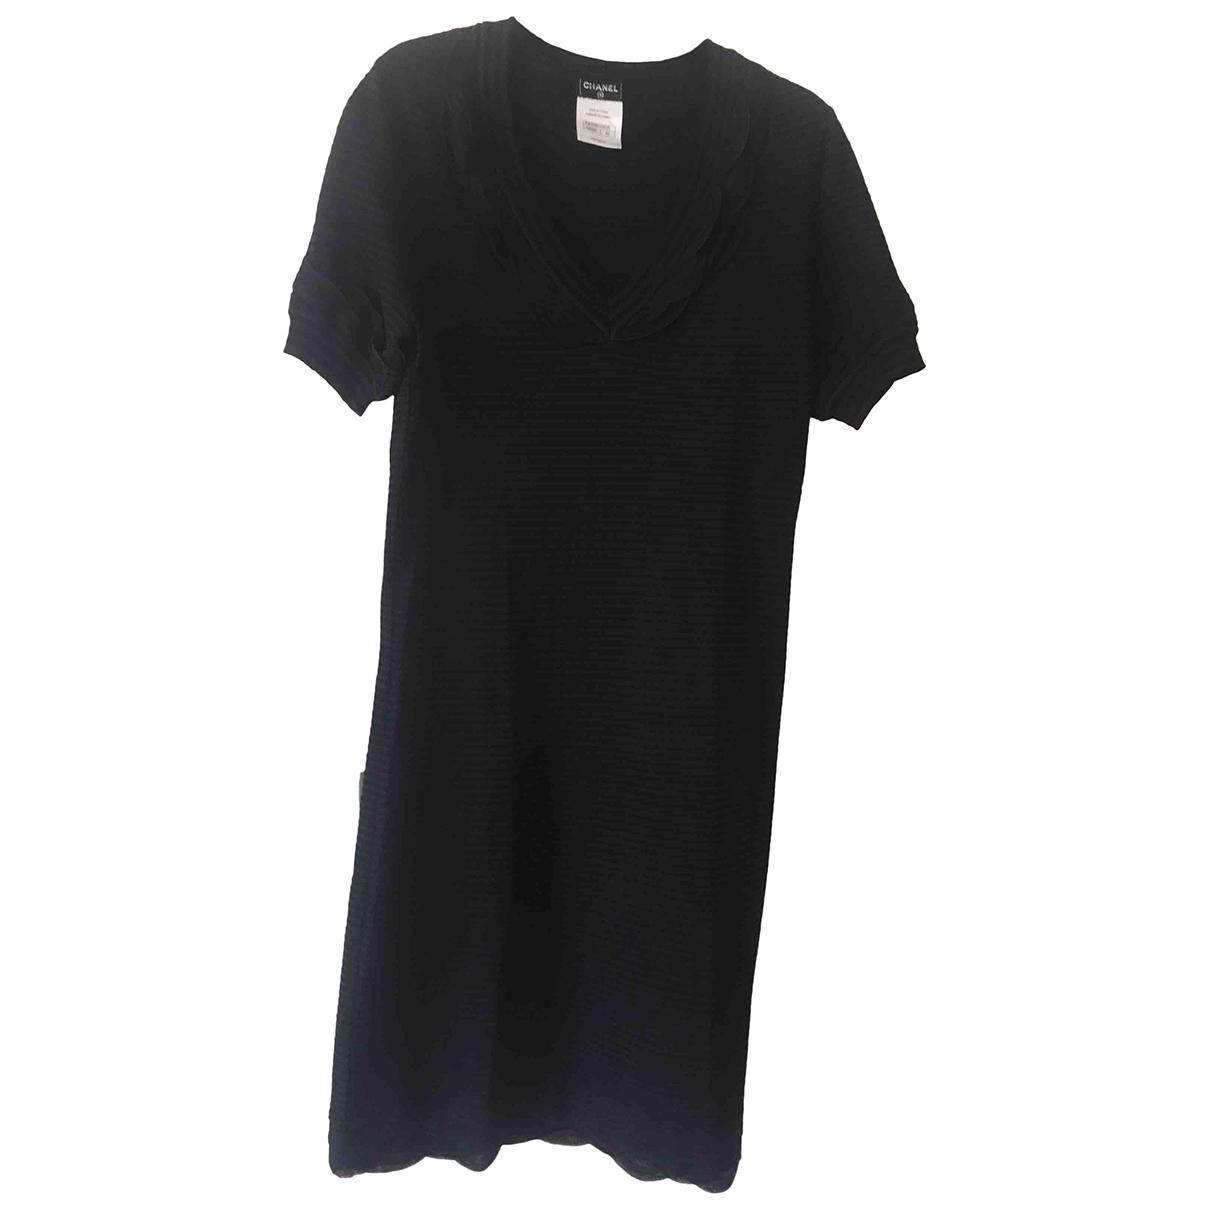 Chanel \N Cotton - elasthane dress for Women 40 FR